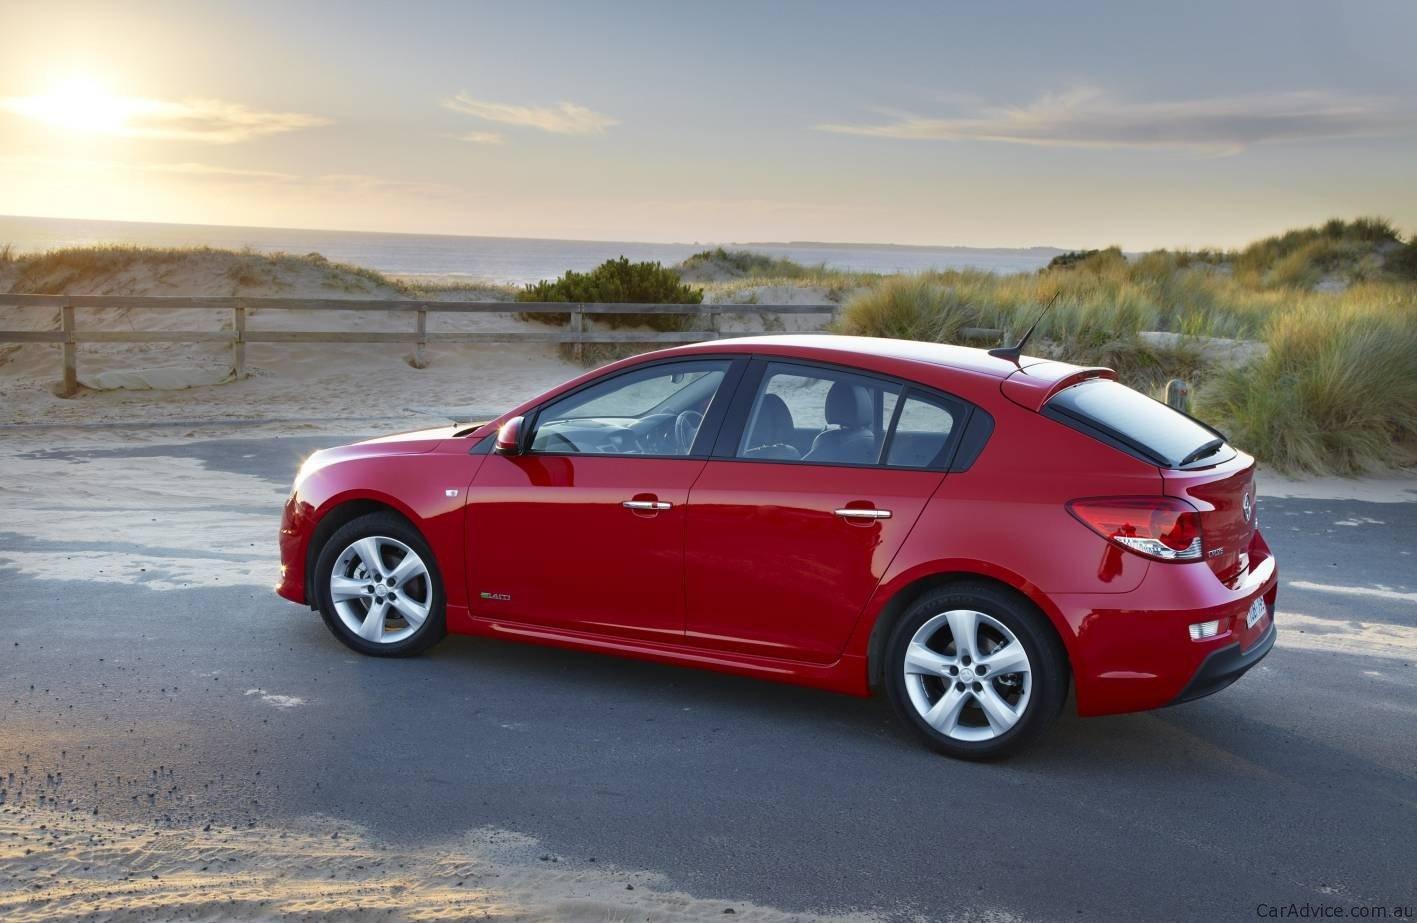 Holden Cruze For Sale >> Holden Cruze hatch on sale in Australia - photos | CarAdvice